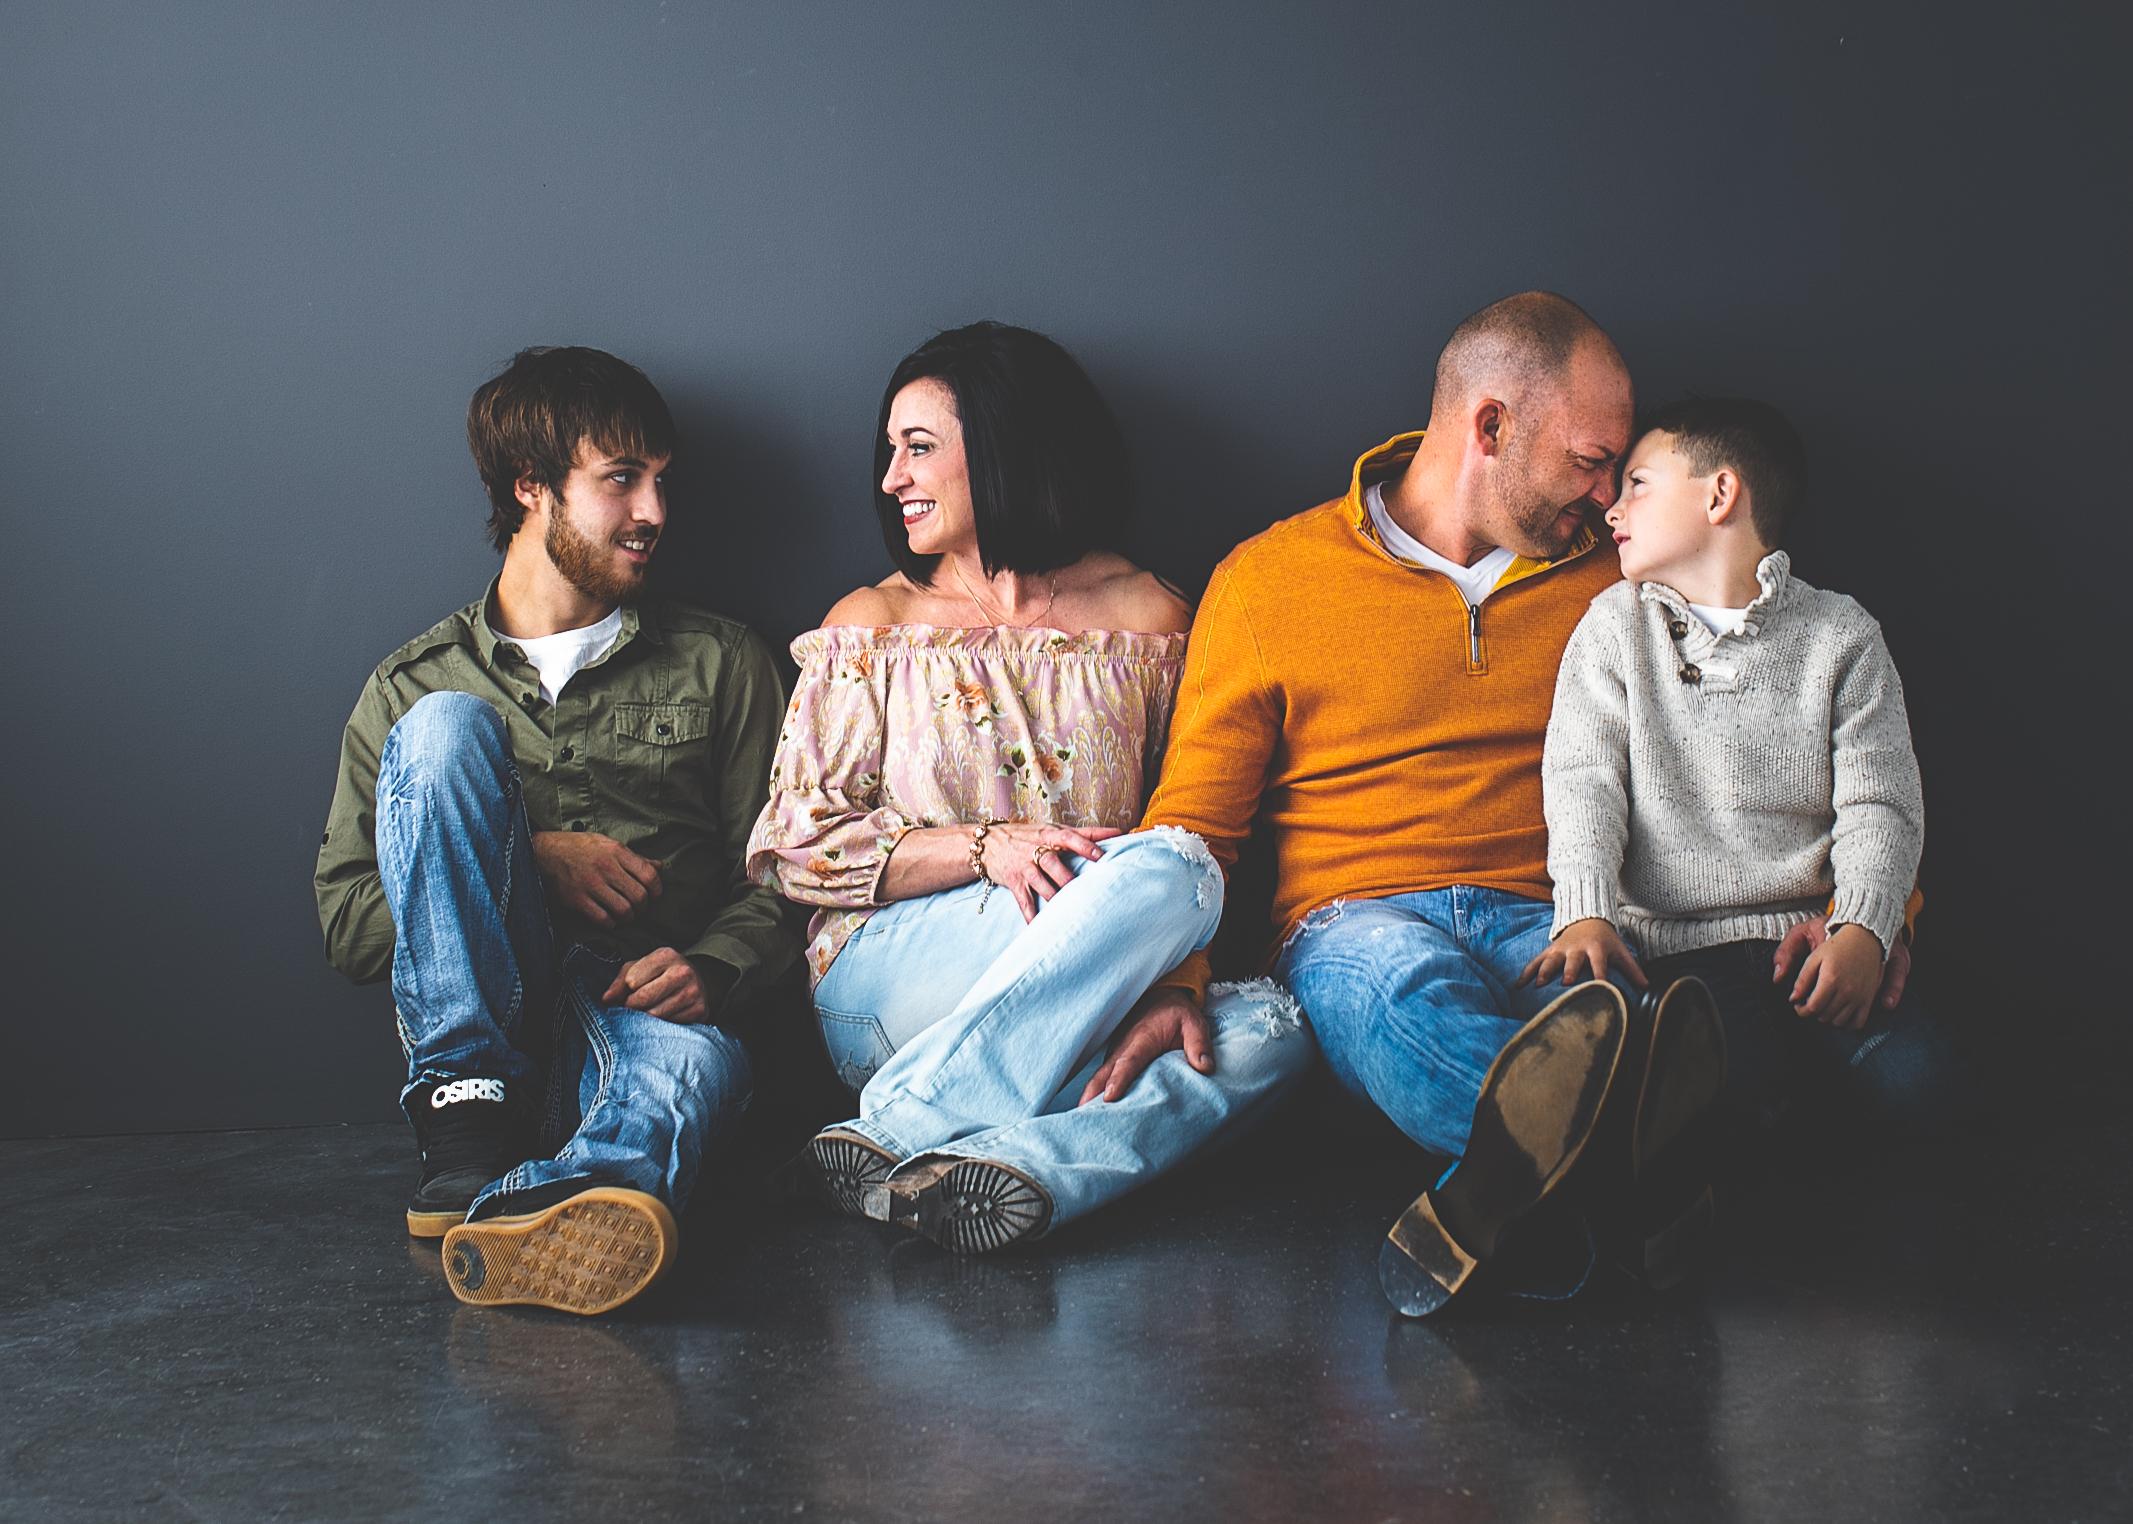 Familypics-0002.jpg